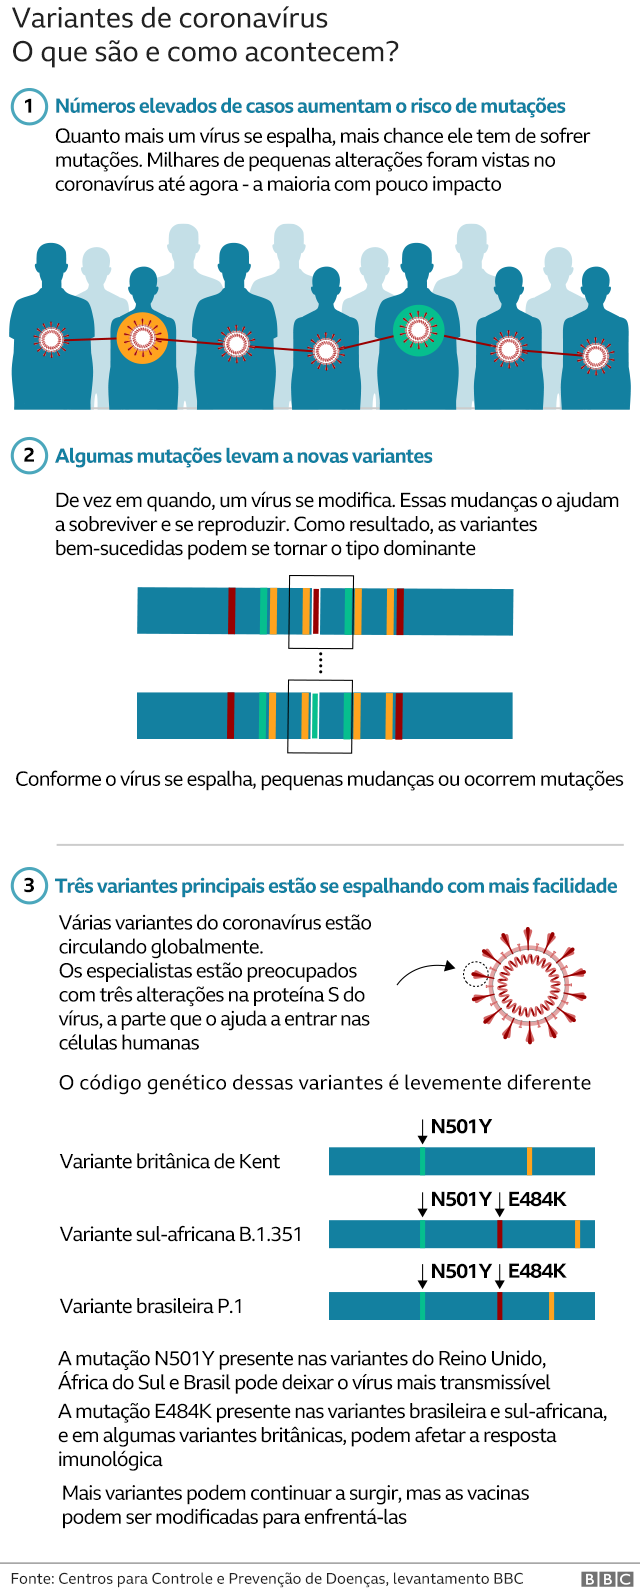 Gráfico sobre variantes do coronavírus